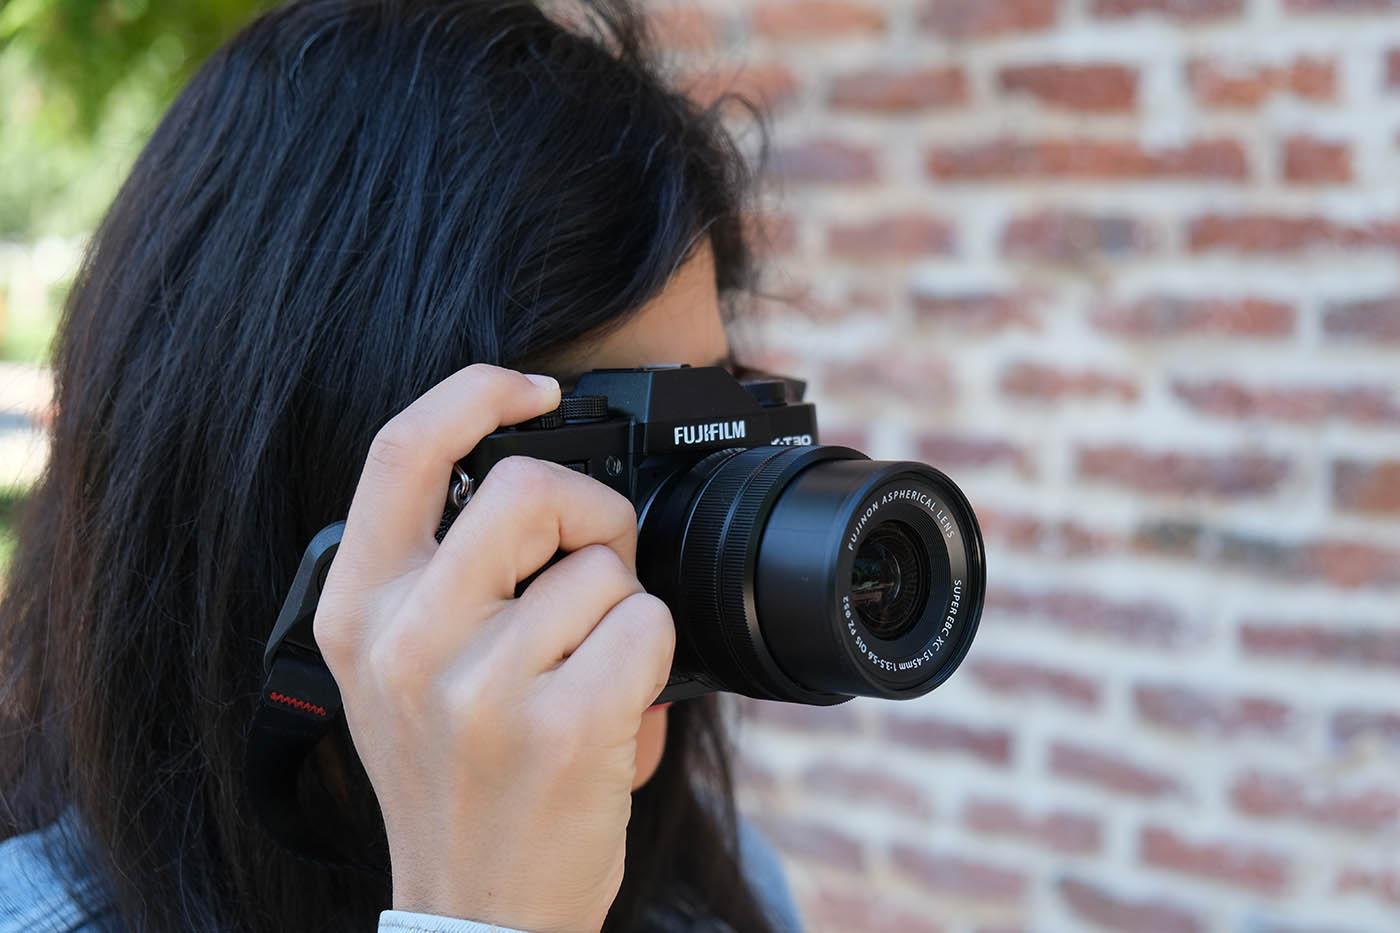 Fuji XT30 + objectif XC 15 45